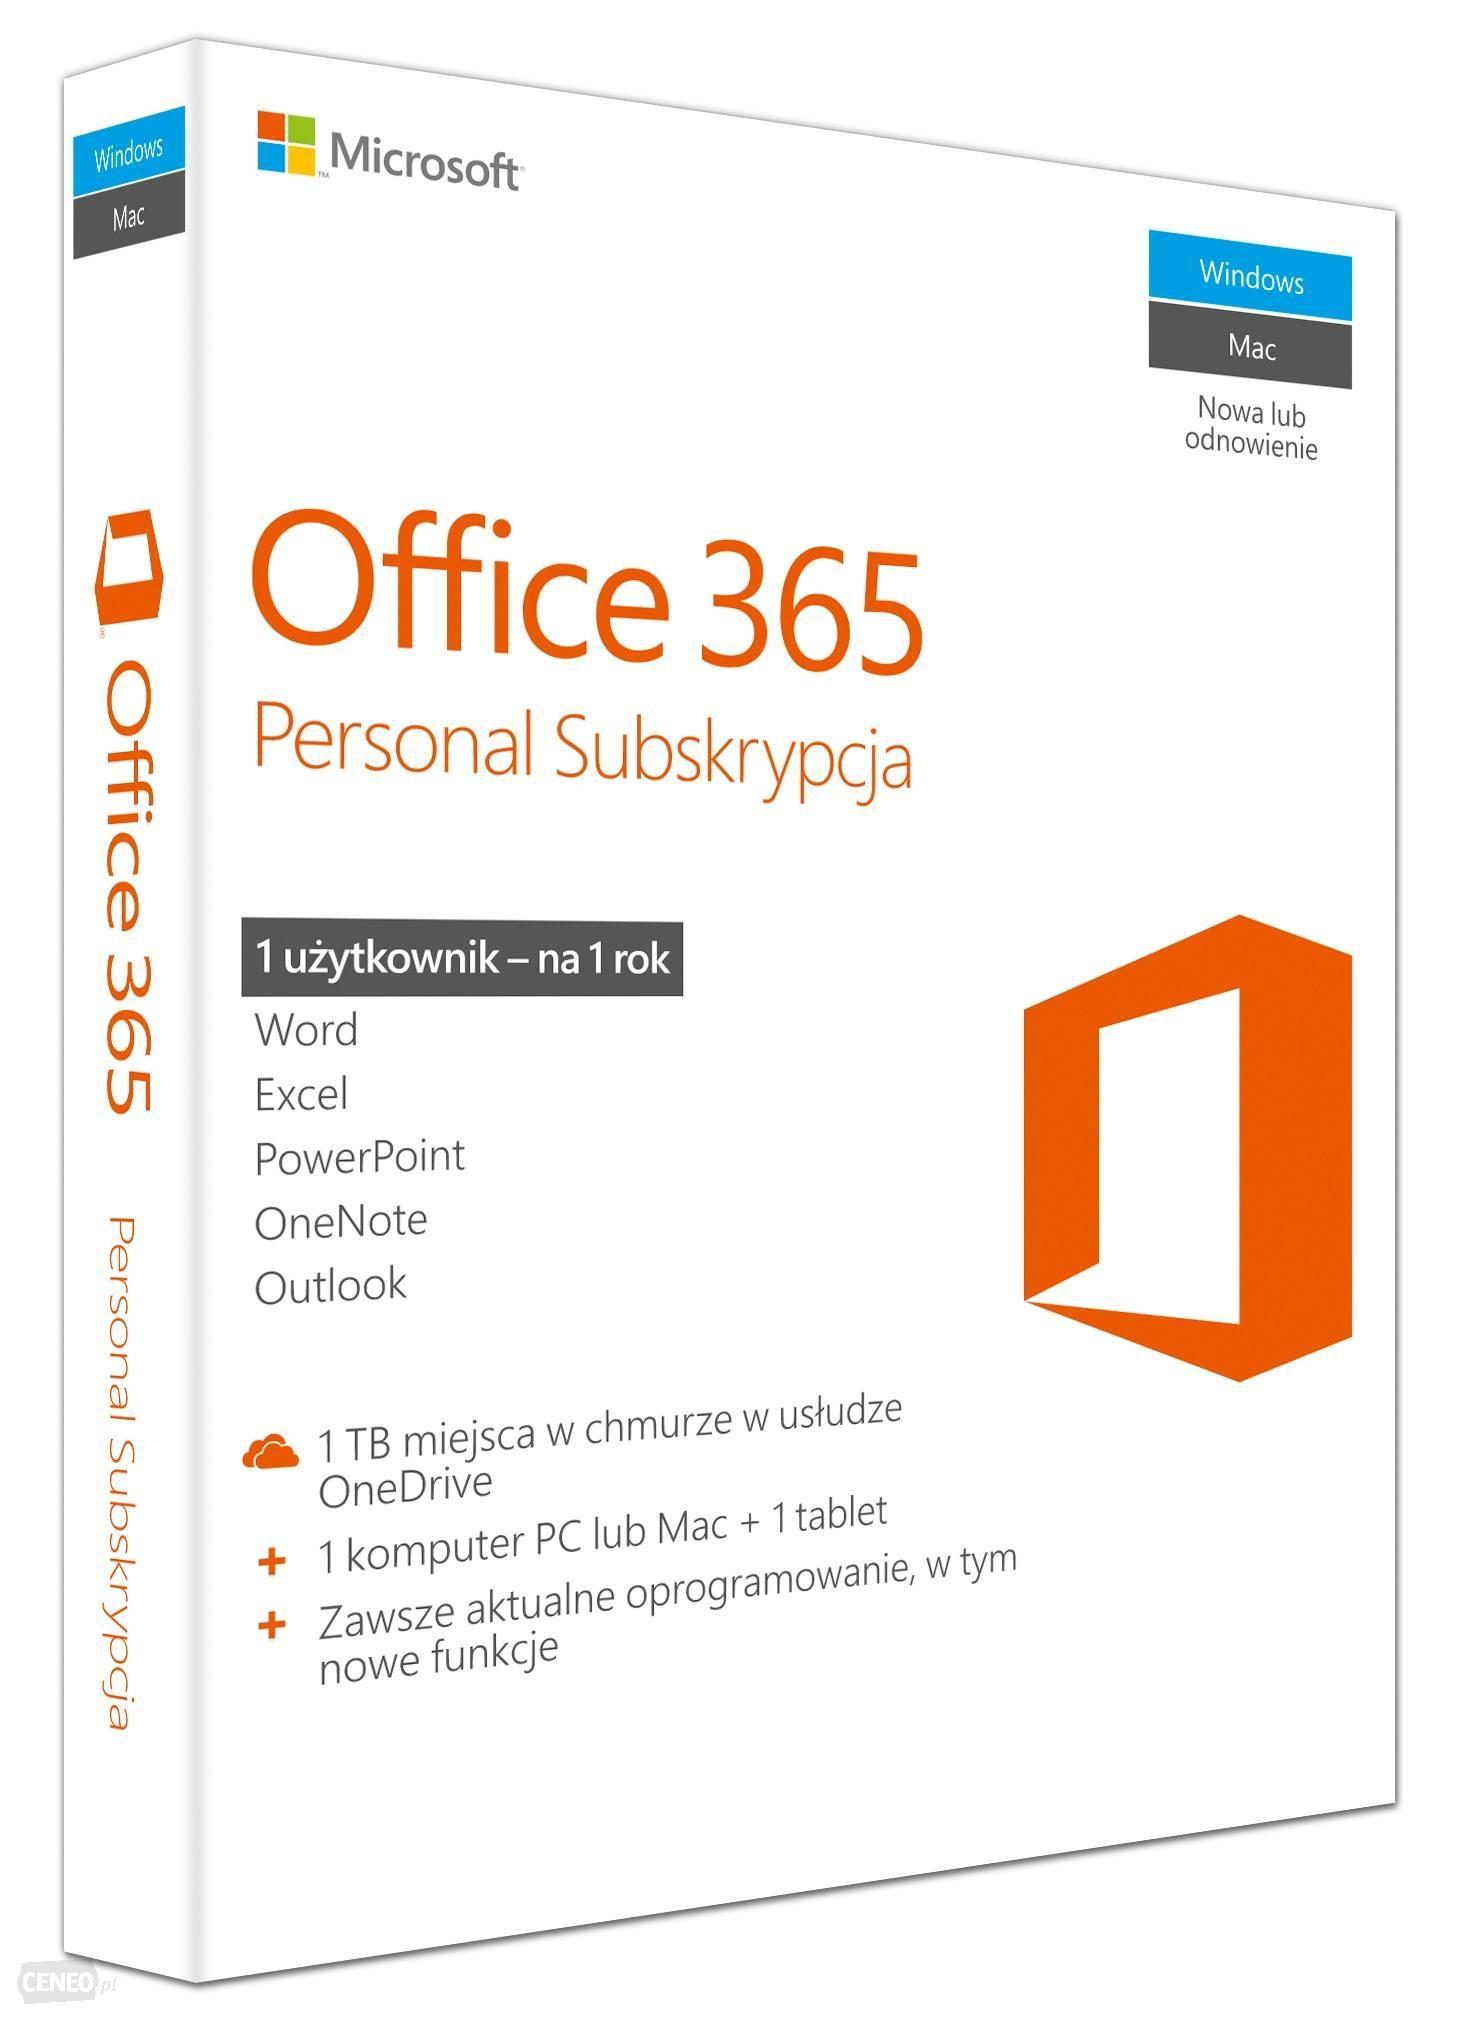 Microsoft Office 365 Home 5PC + OneDrive 5TB licencja na rok AMAZON.IT